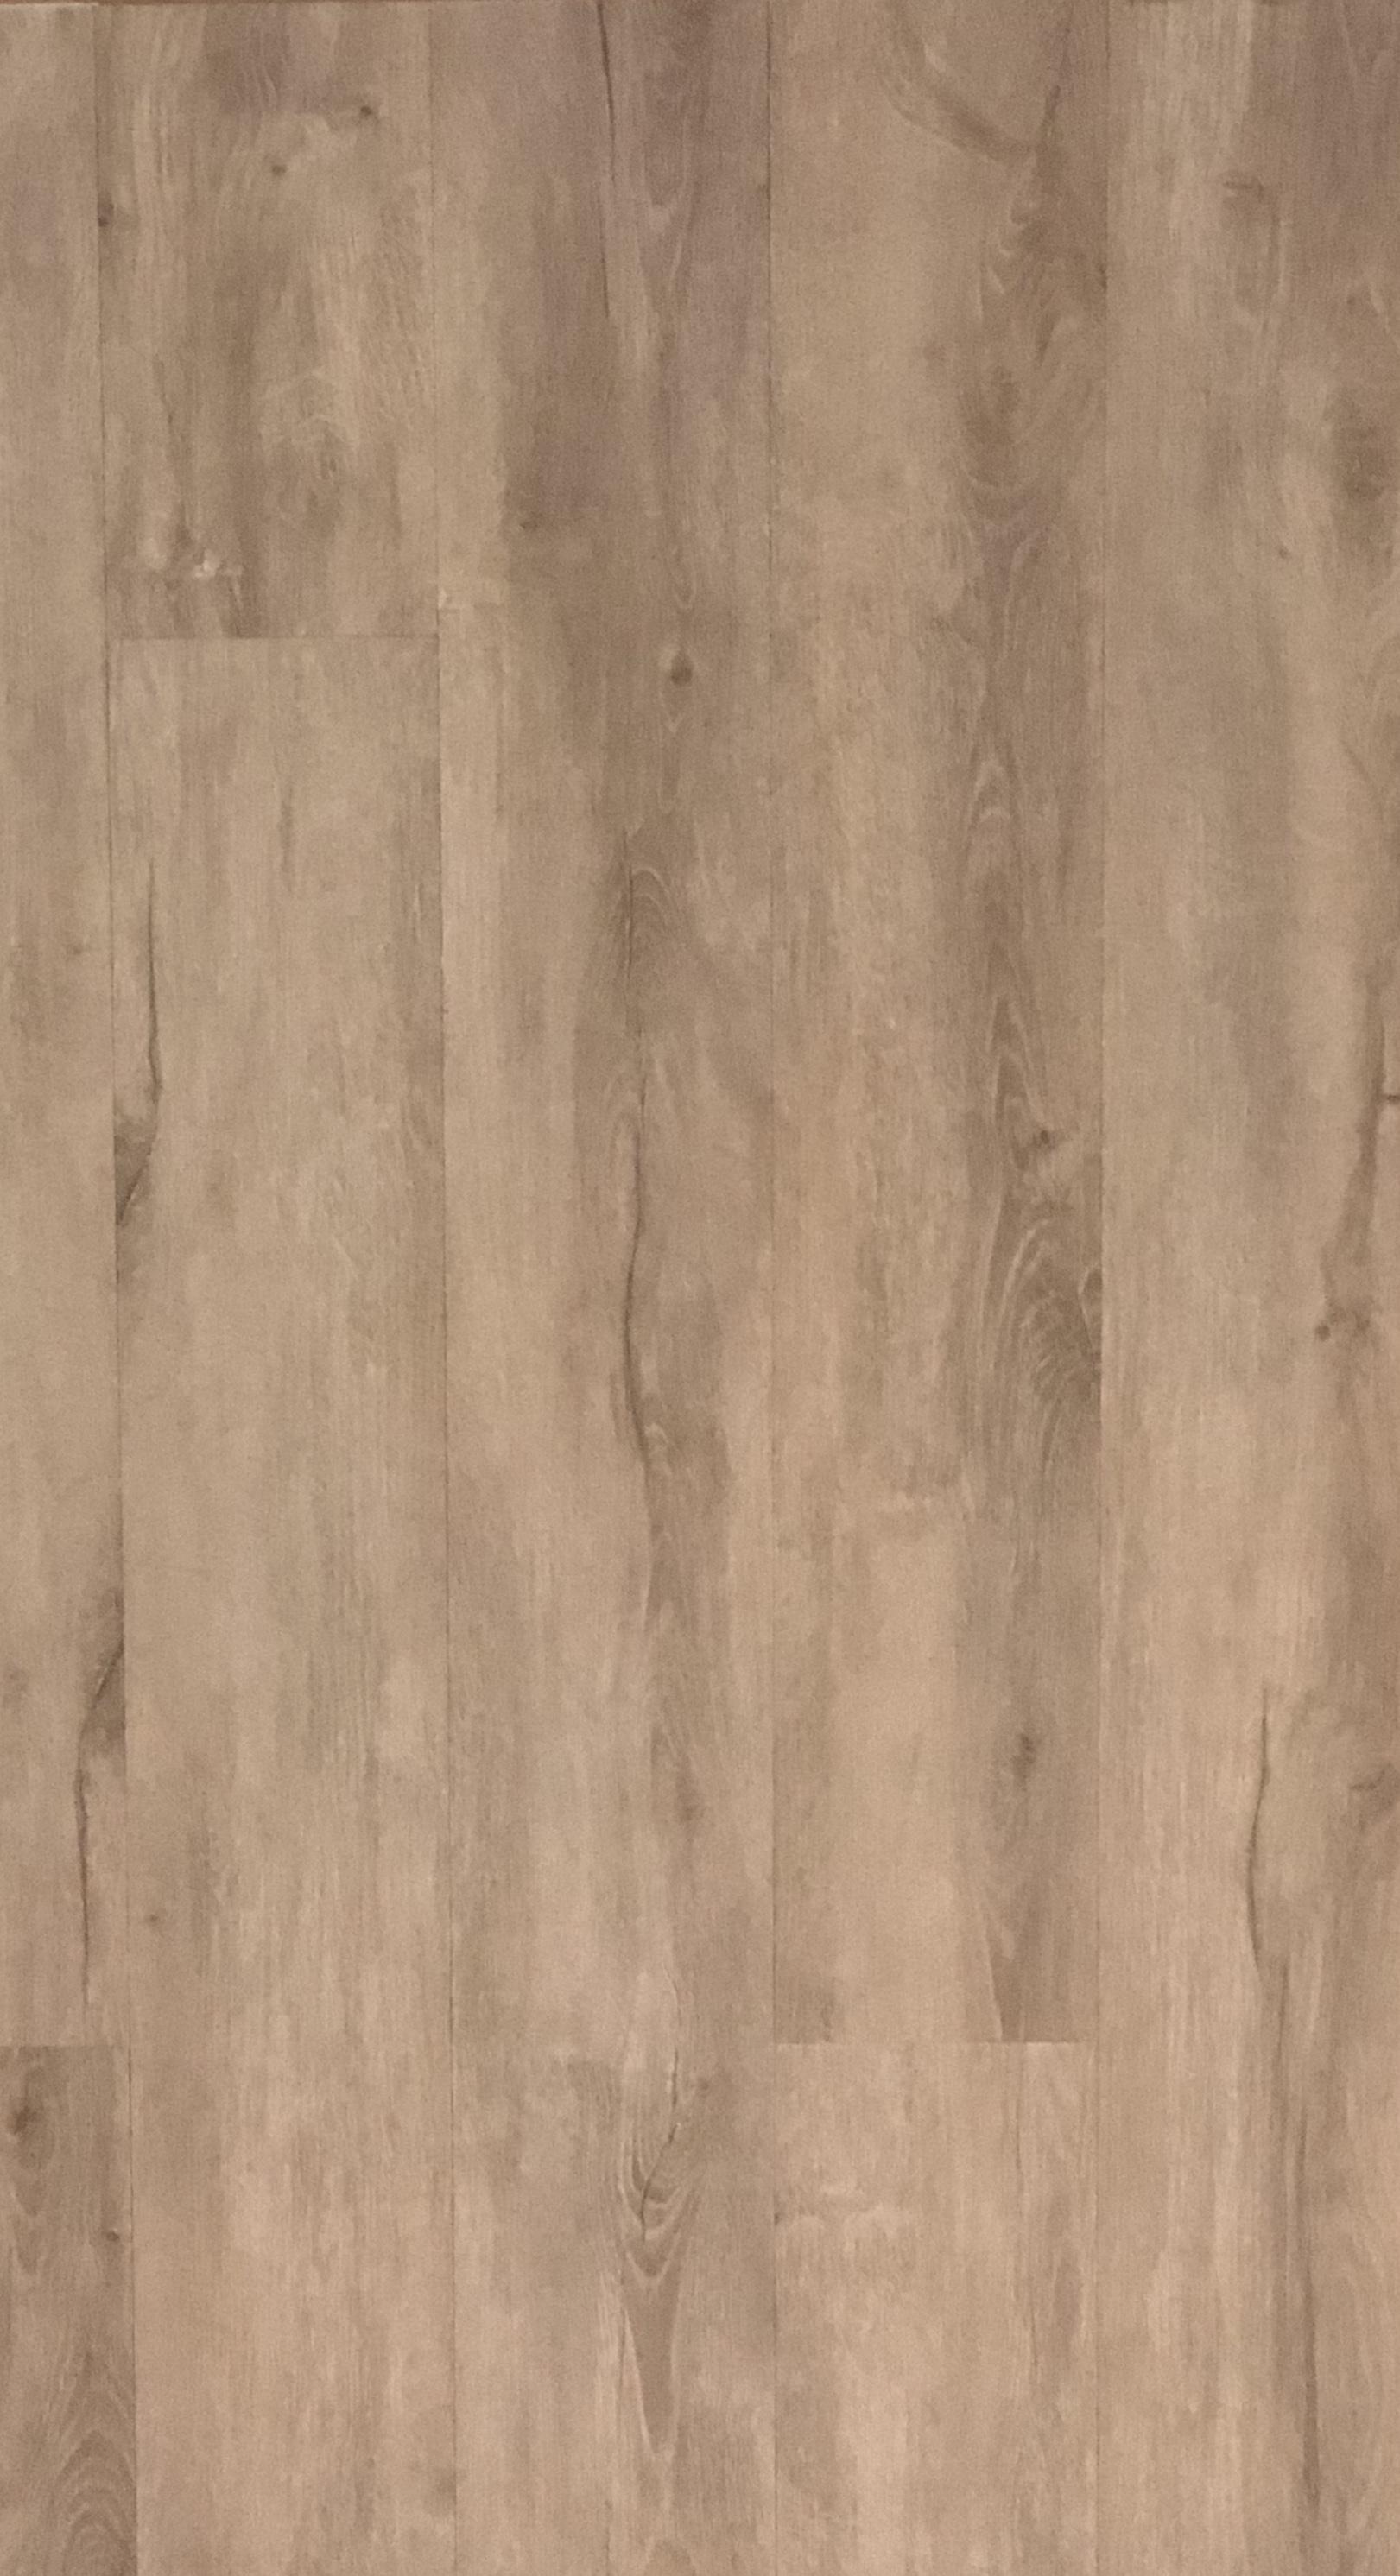 Southwind Harbor Plank Beachwood Carpet Fashions Inc